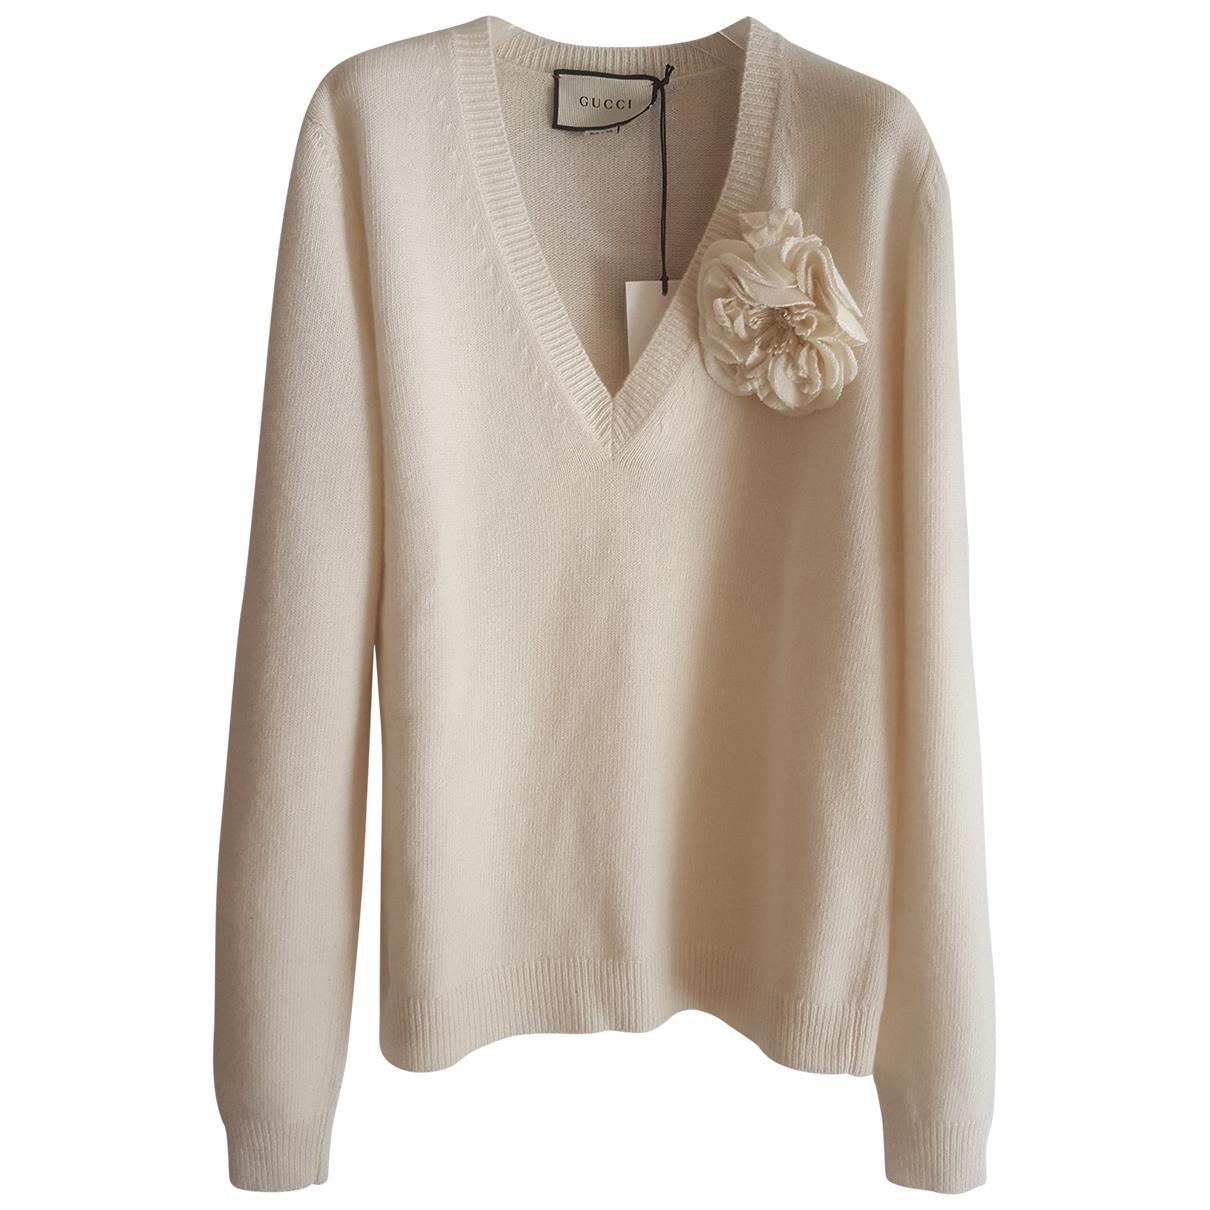 Gucci \N White Cashmere Knitwear for Women S International